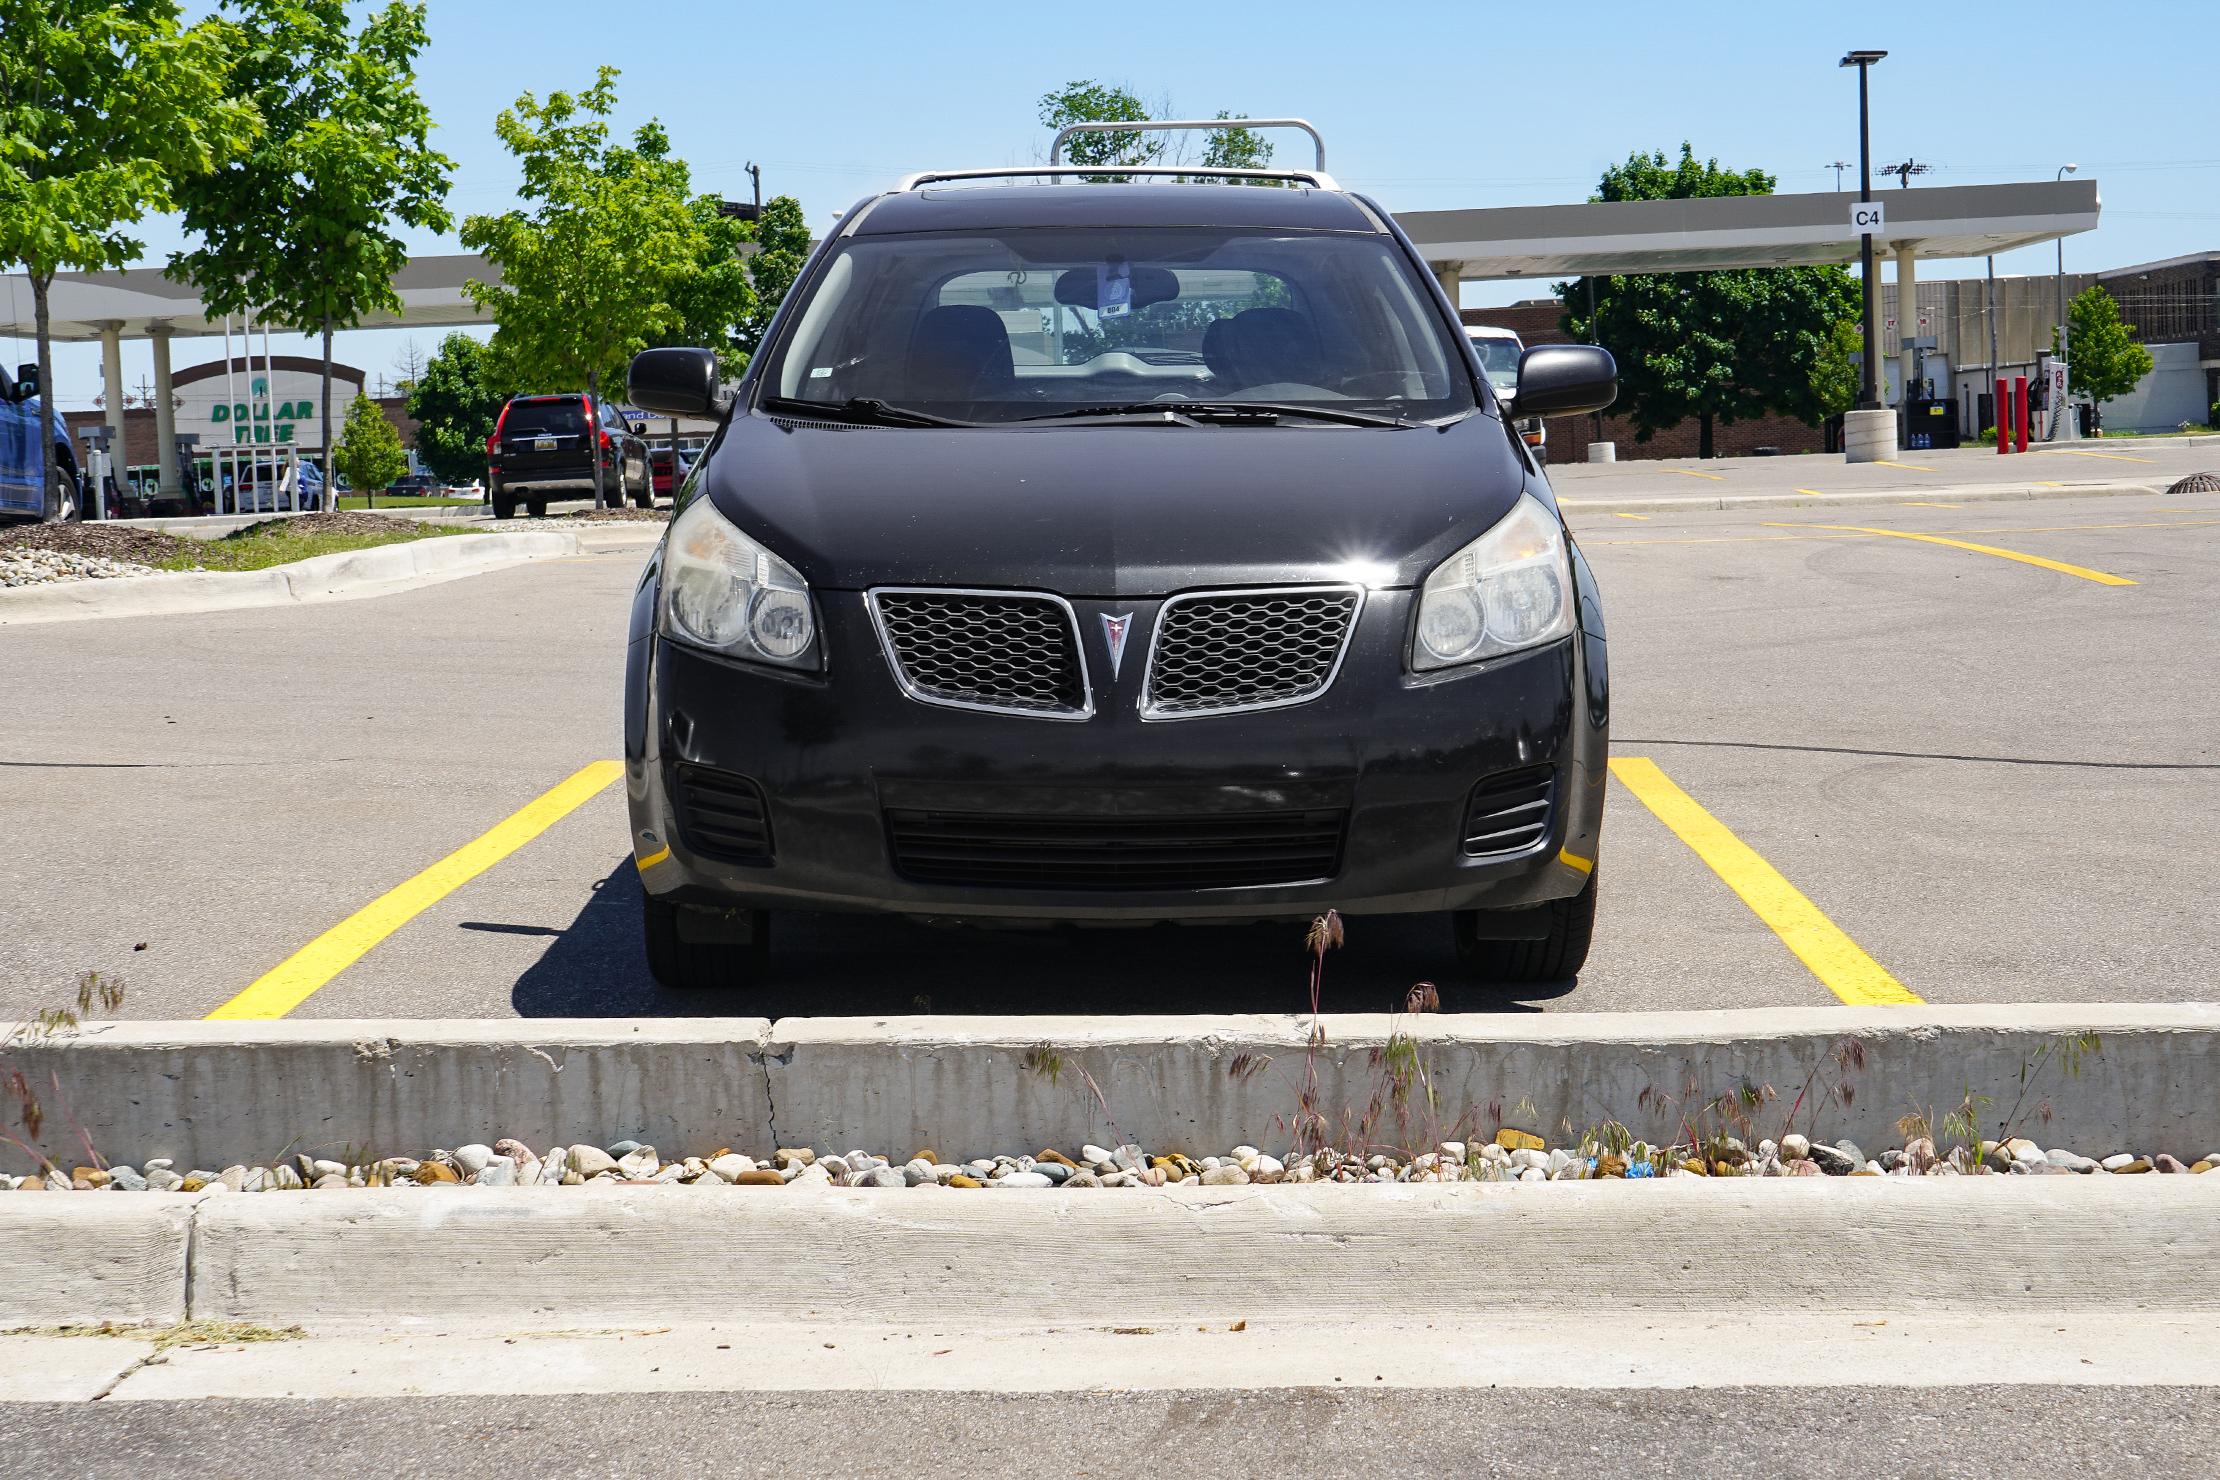 Car In Parking Lot Road Trip Guide